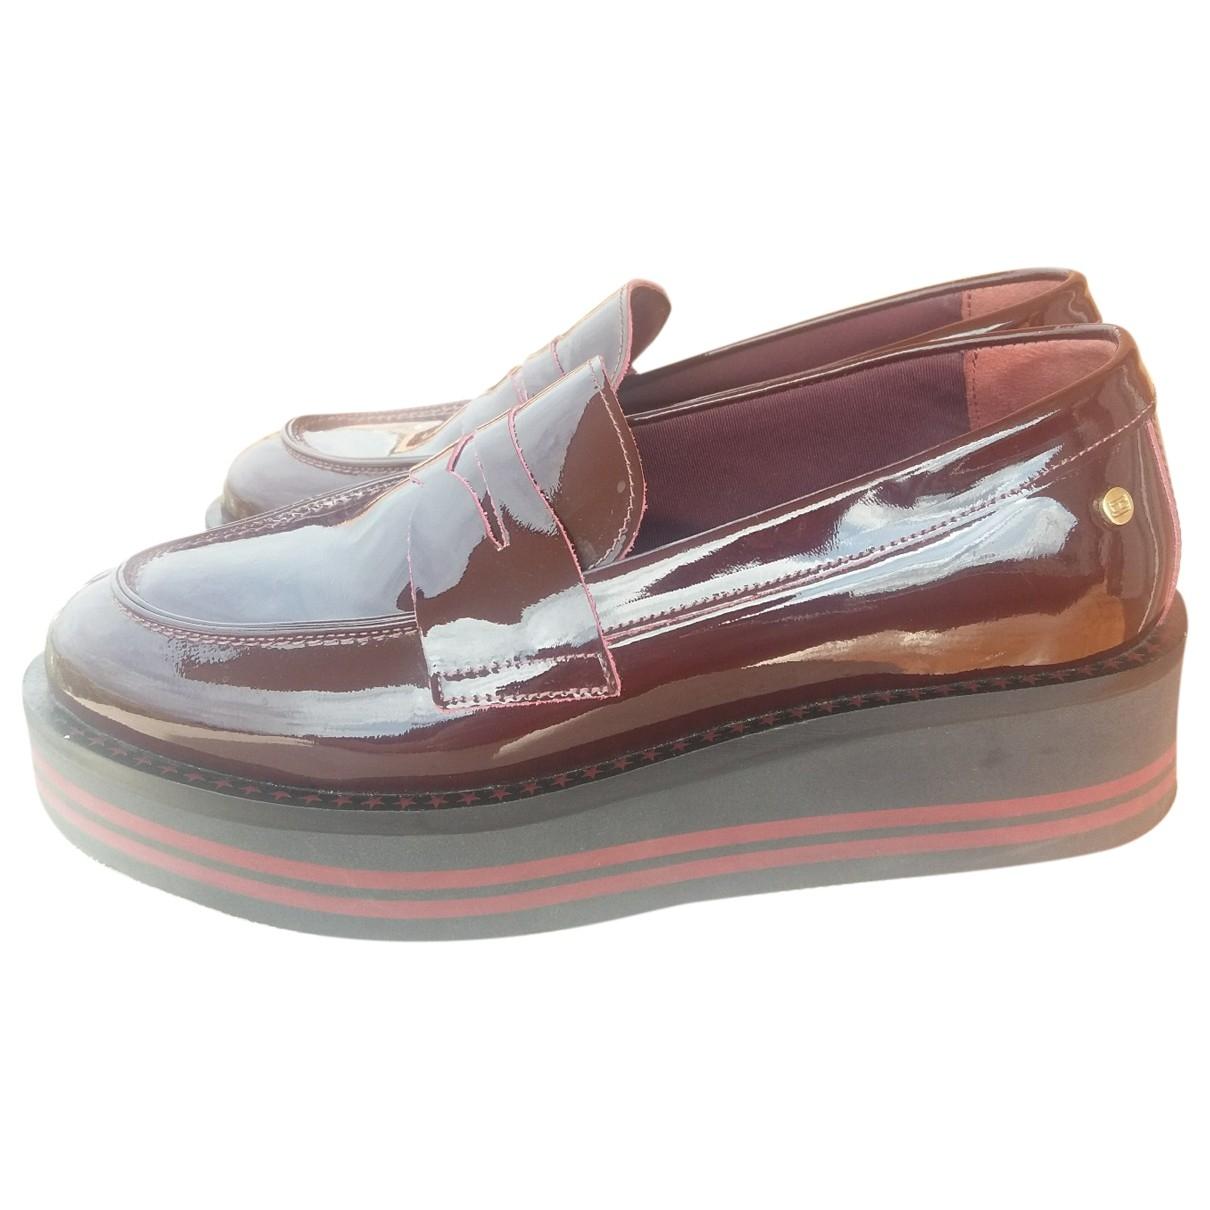 Tommy Hilfiger \N Burgundy Leather Flats for Women 38 EU